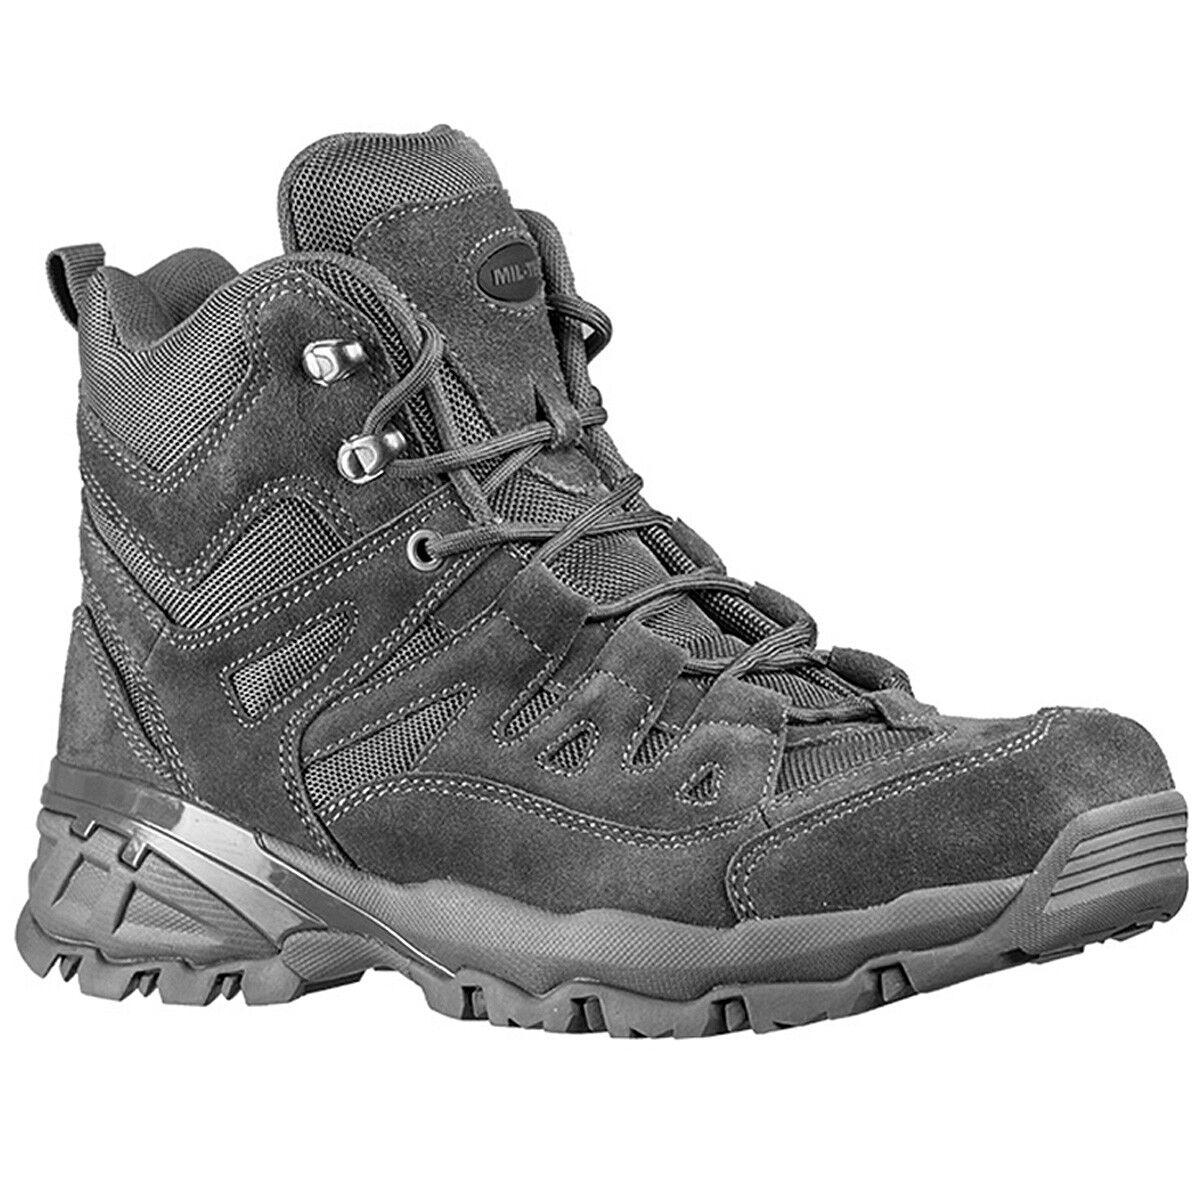 Mil-tec outdoor bota botas Squad trekking semi semi semi botas botas 562b76